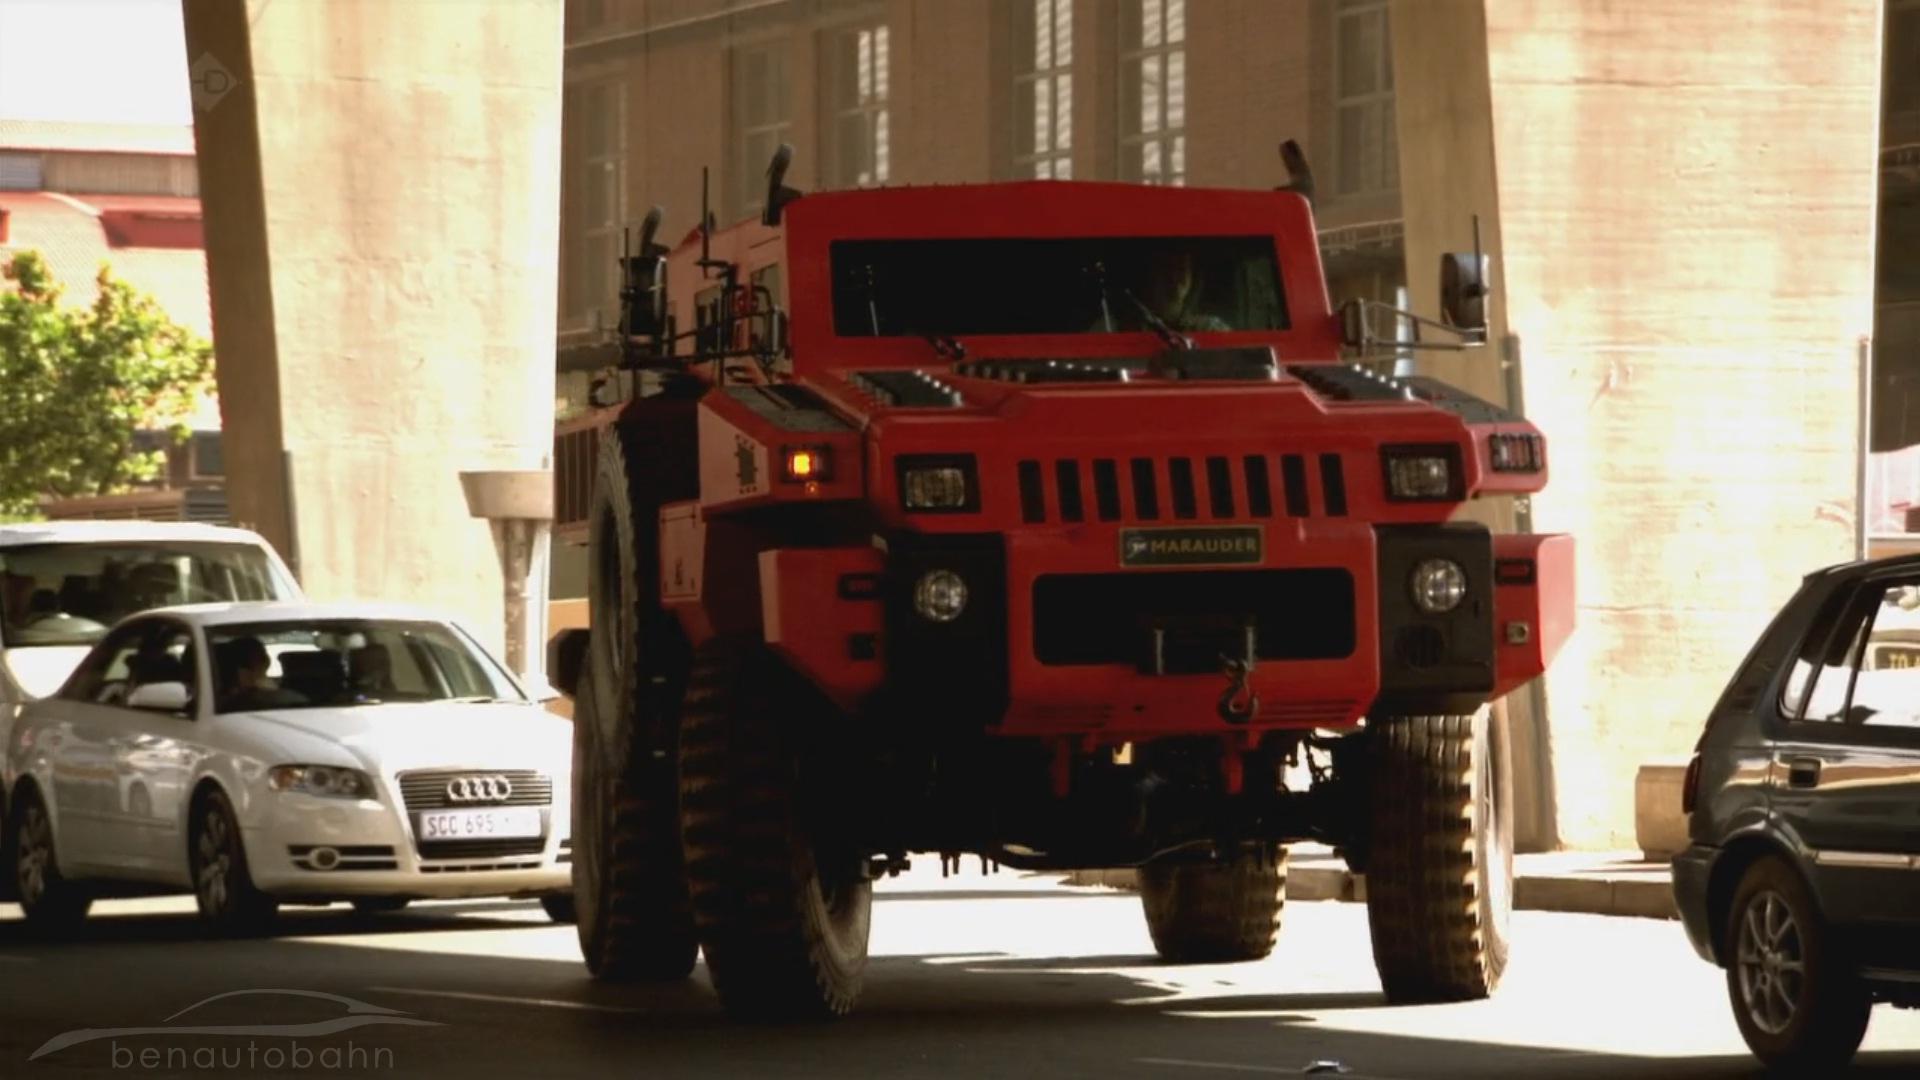 Top Gear Season 17 Episode 1 Review Benautobahn